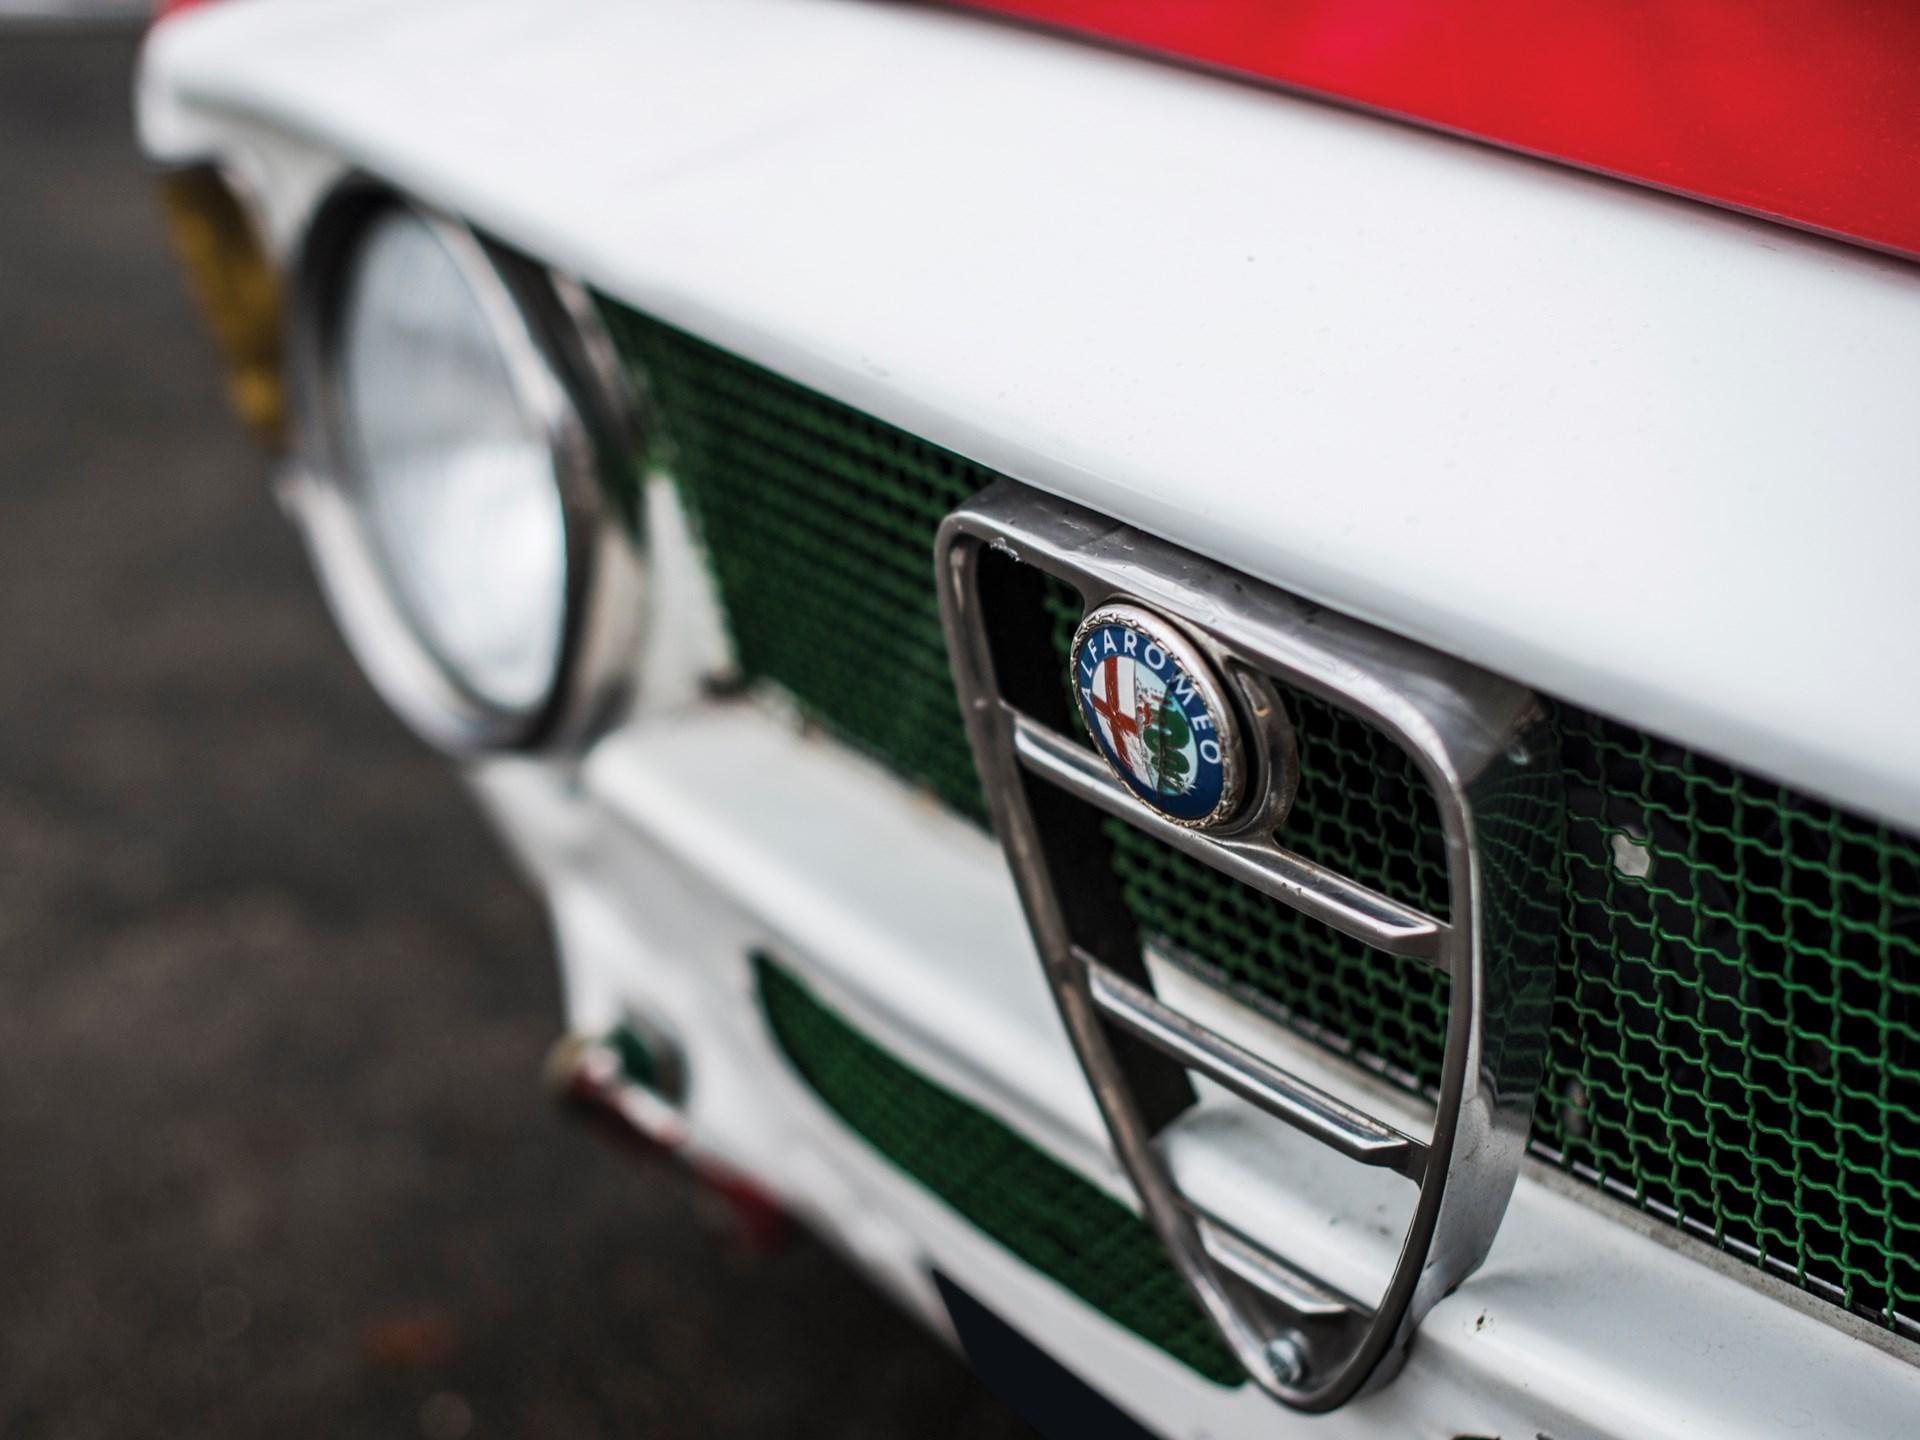 1965 Alfa Romeo Giulia Sprint GTA by Bertone